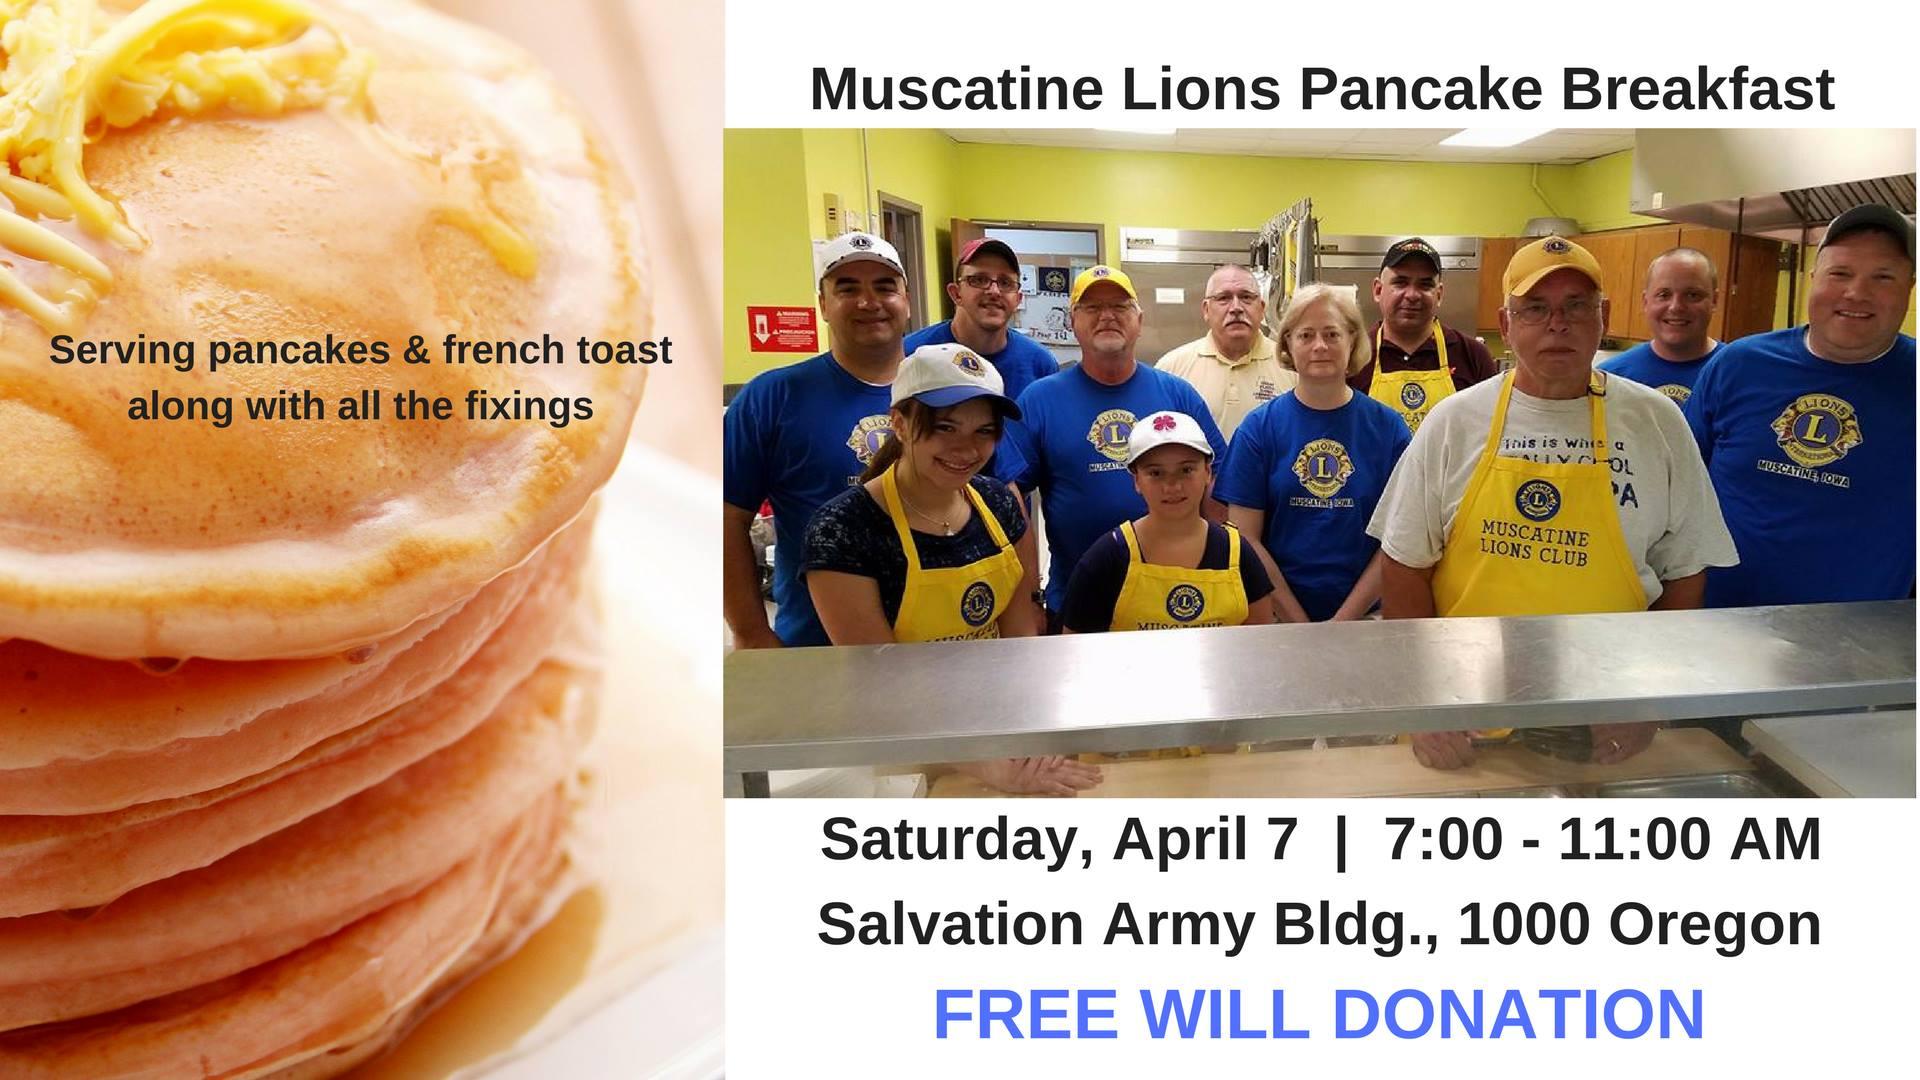 Muscatine Lions Pancake Breakfast